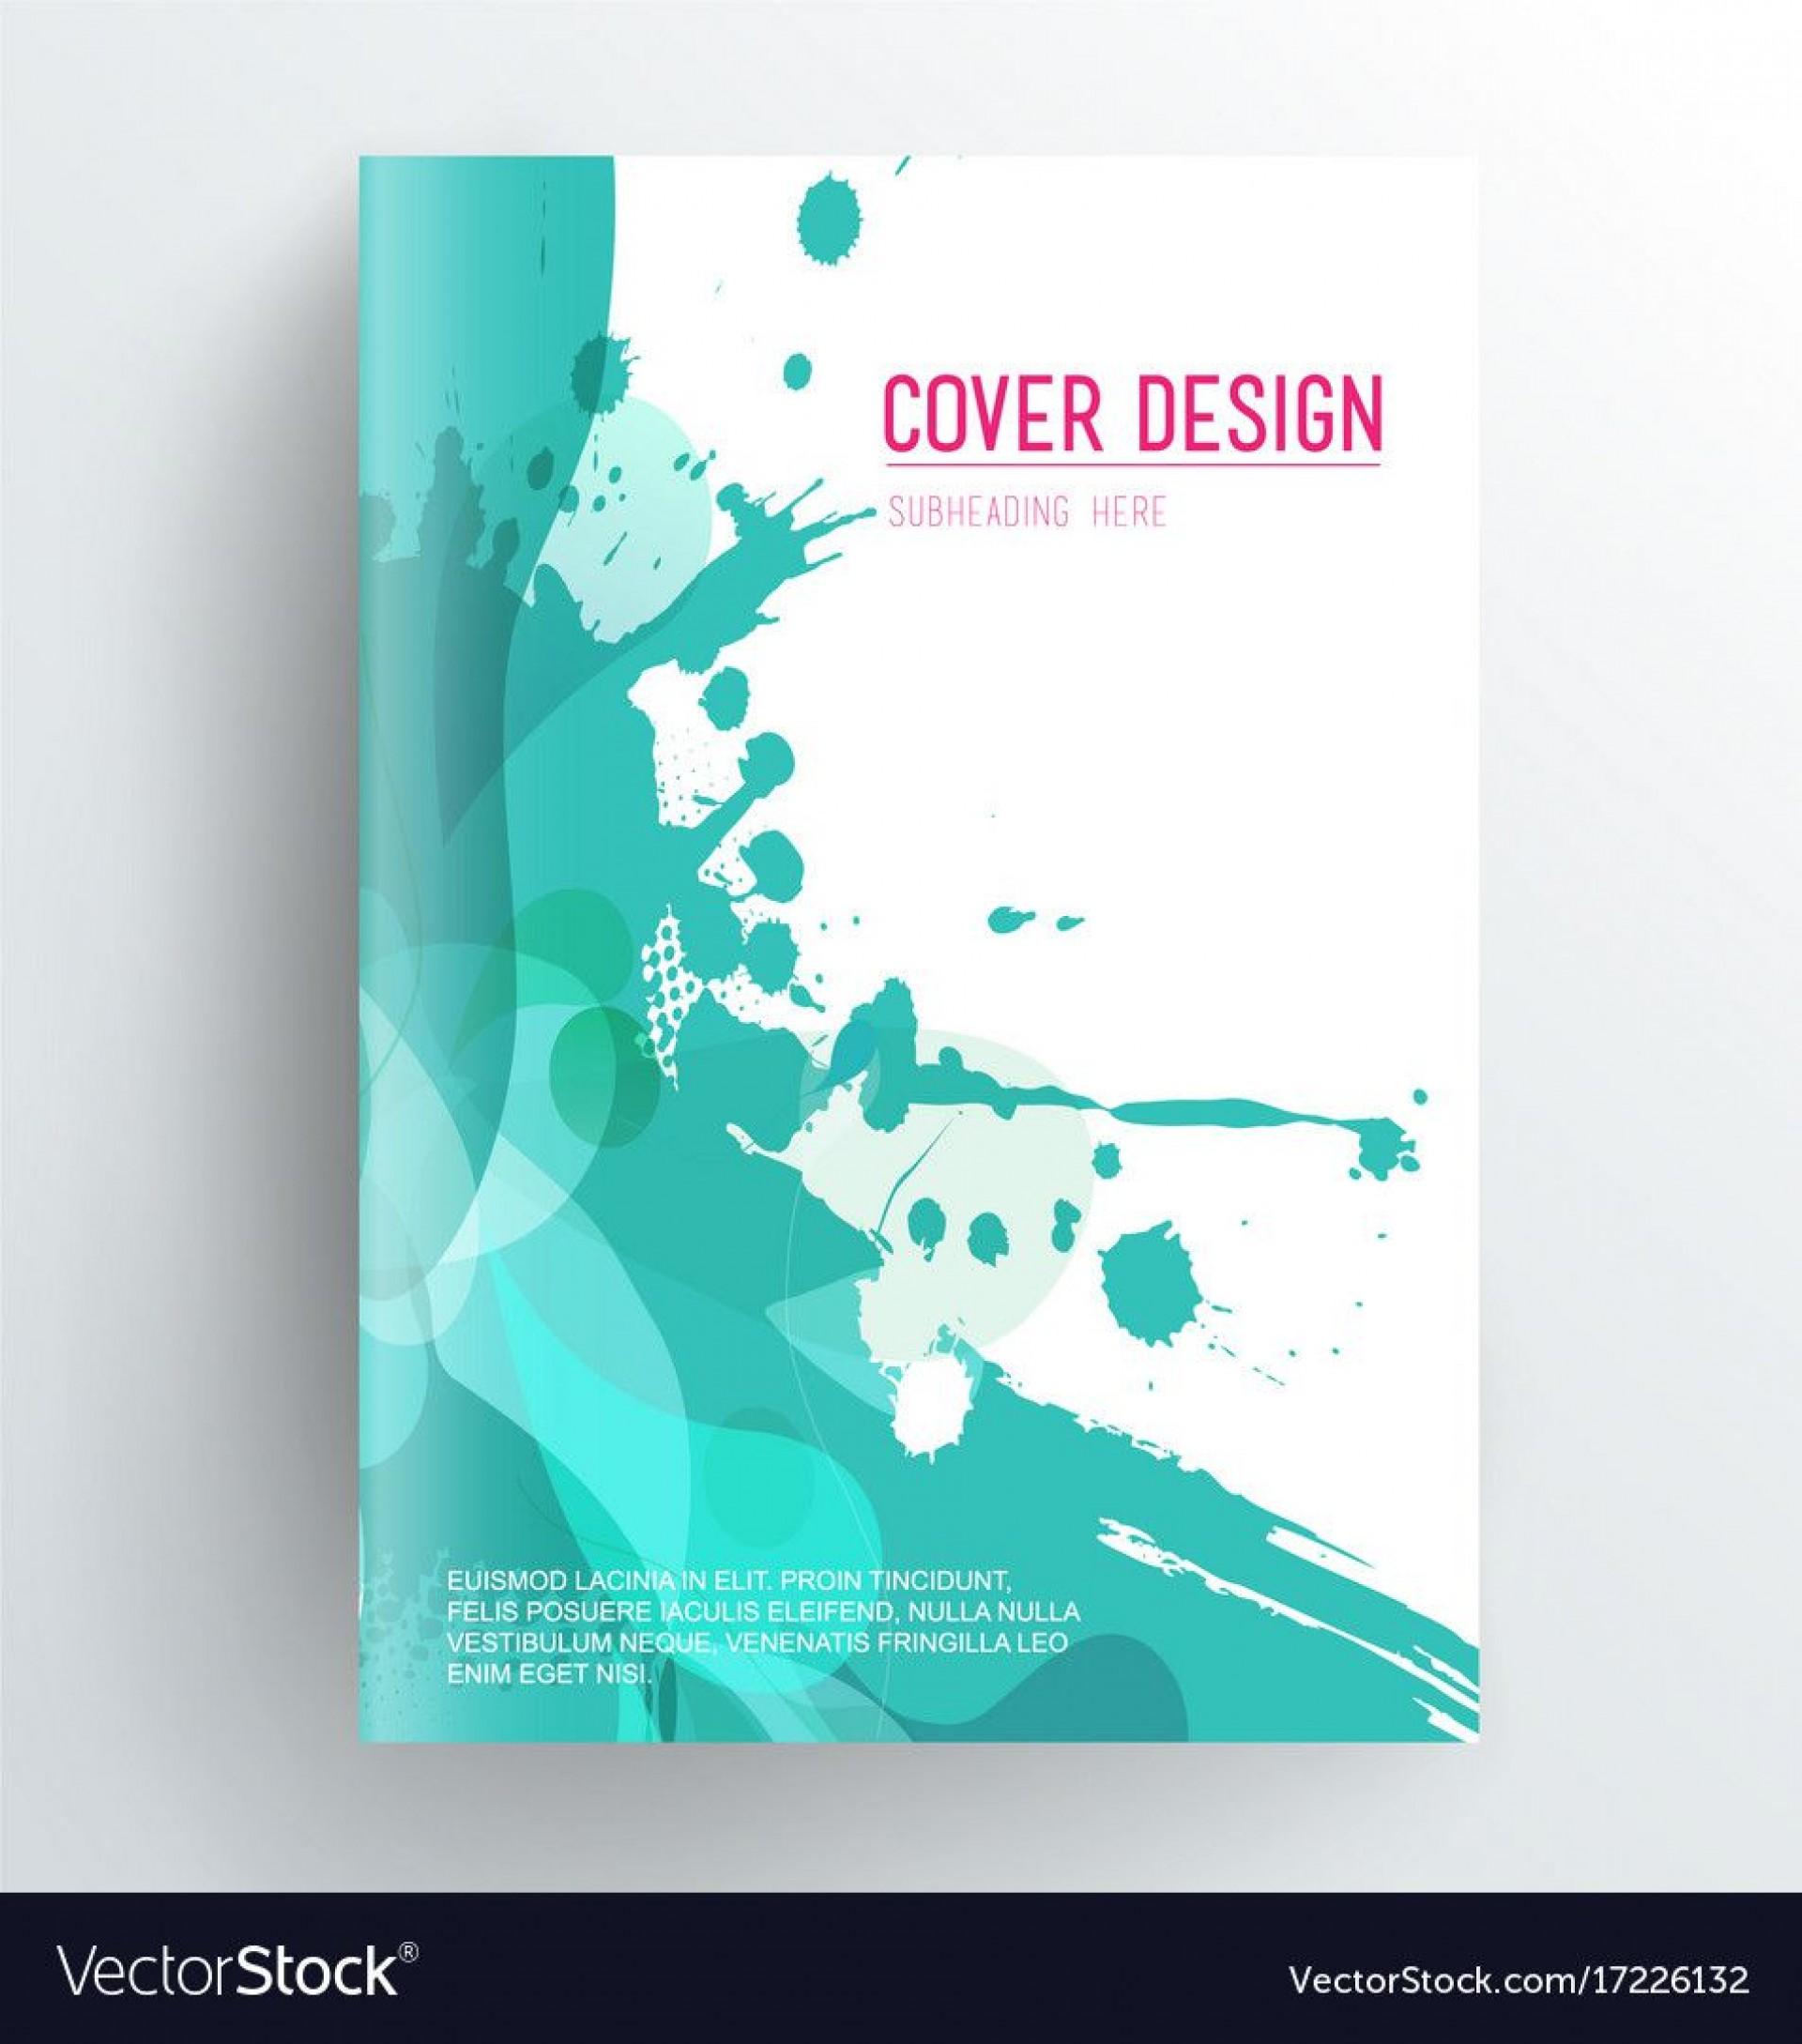 006 Top Book Cover Template Free Download High Resolution  Illustrator Design Vector Illustration1920